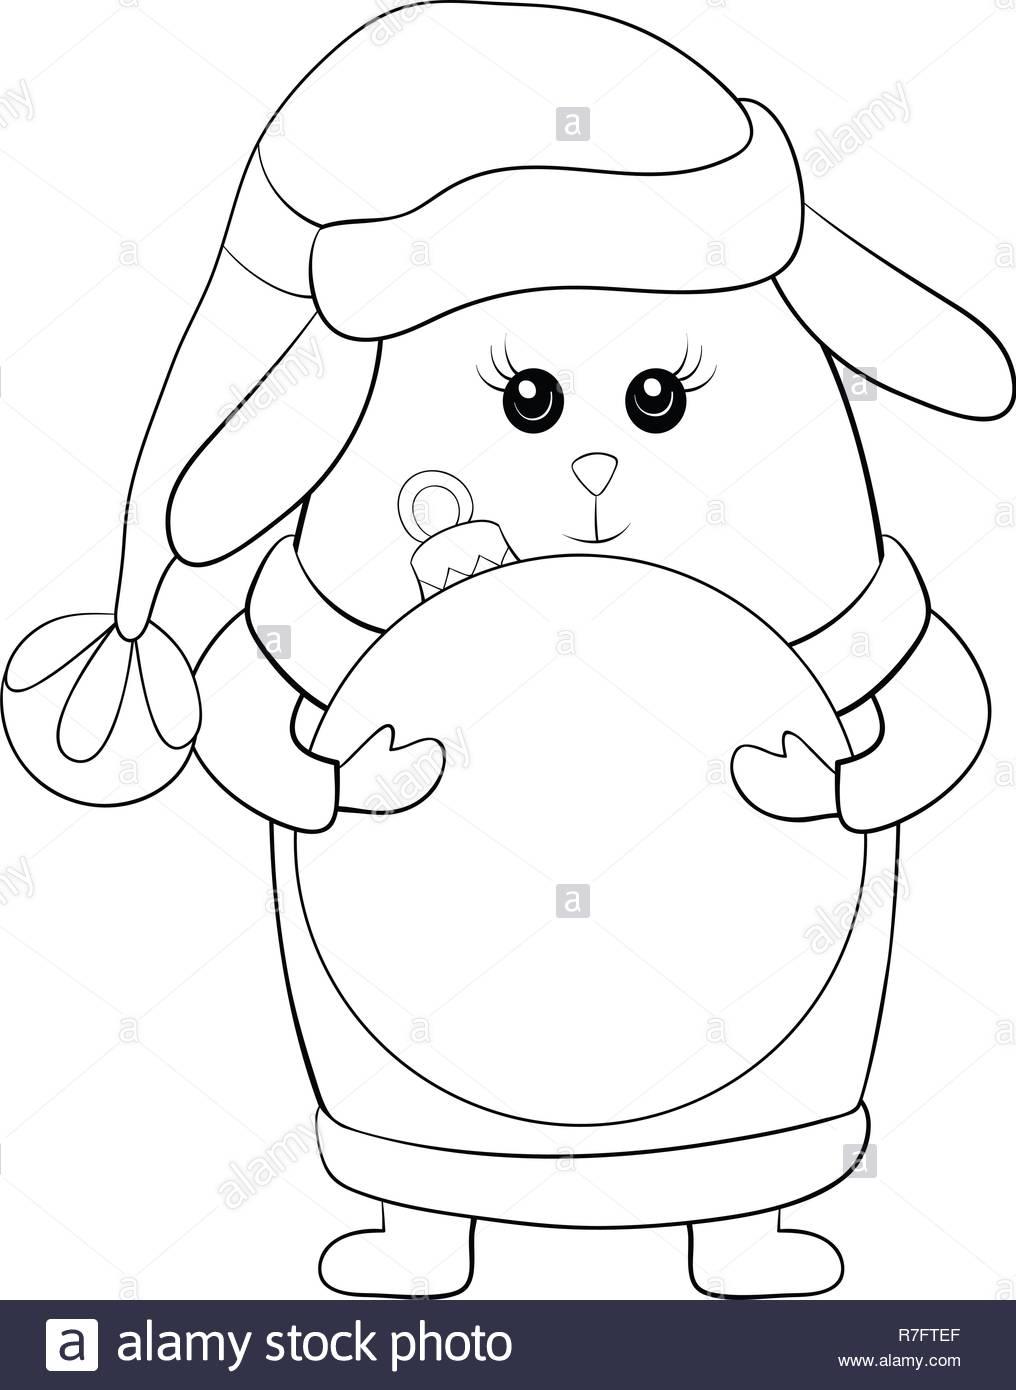 Christmas Boots Drawing.A Cartoon Rabbit Wearing A Christmas Cap Waistcoat Gloves